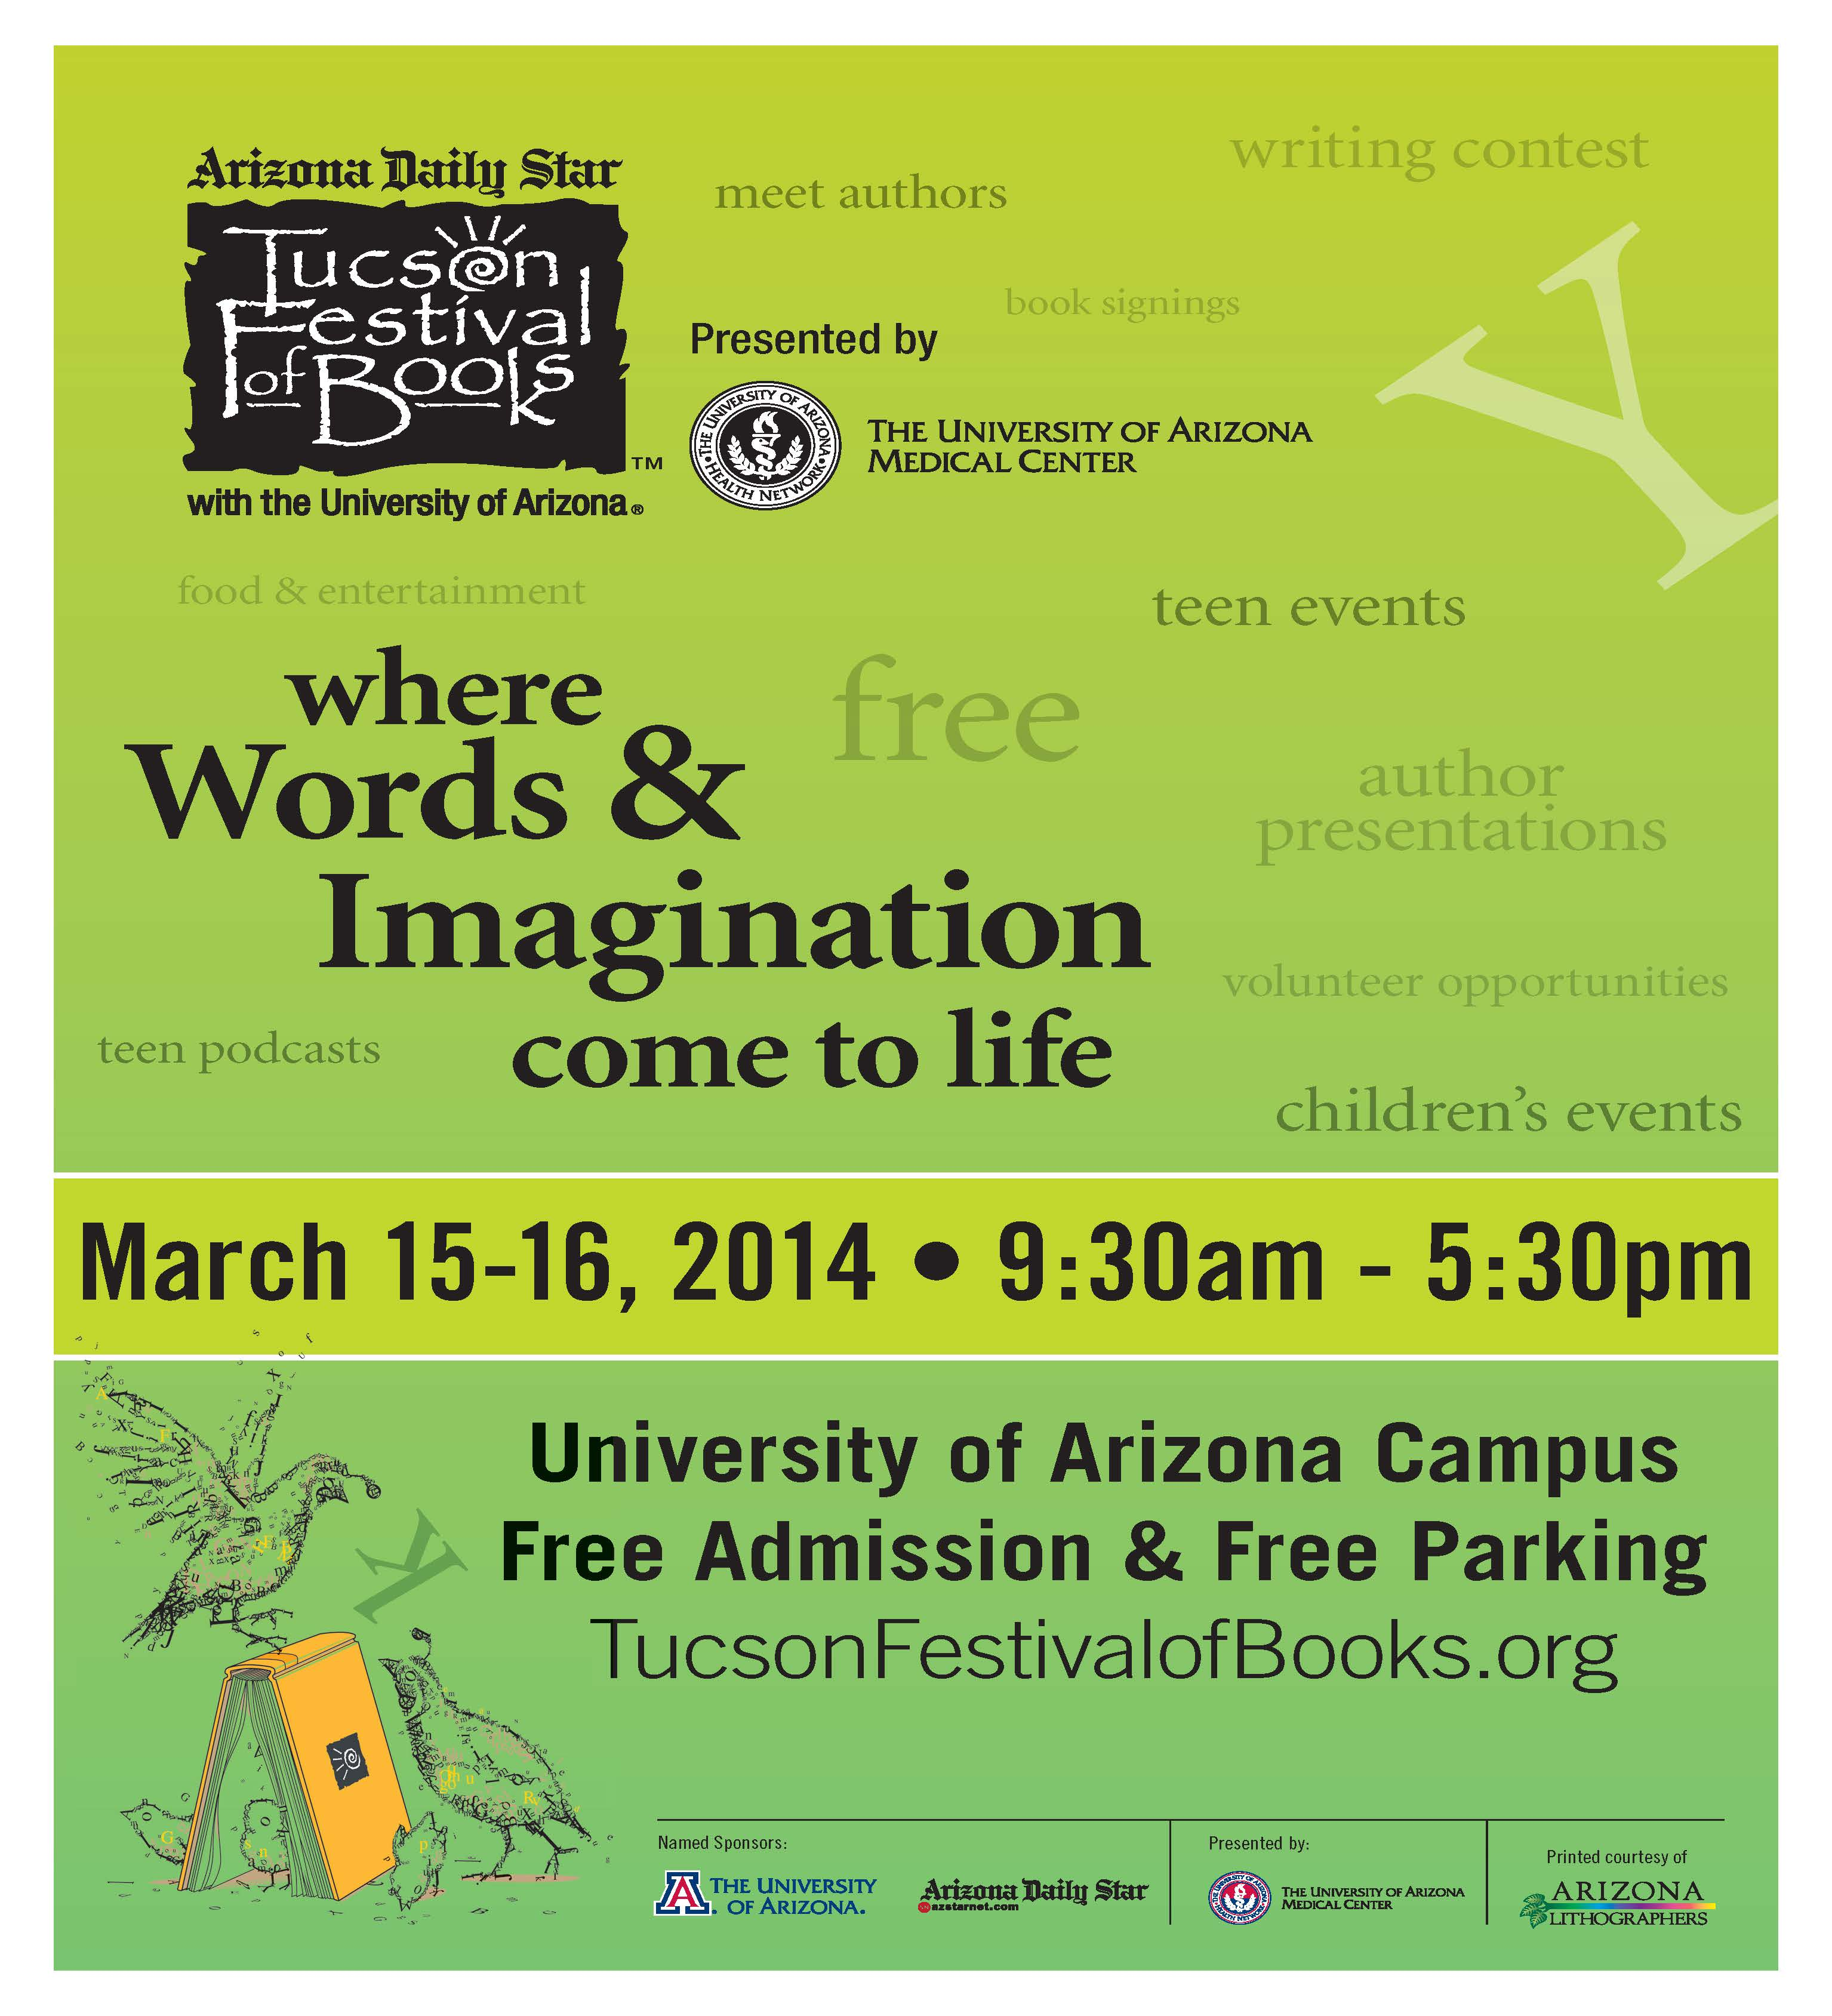 Tucson-Festival-of-Books